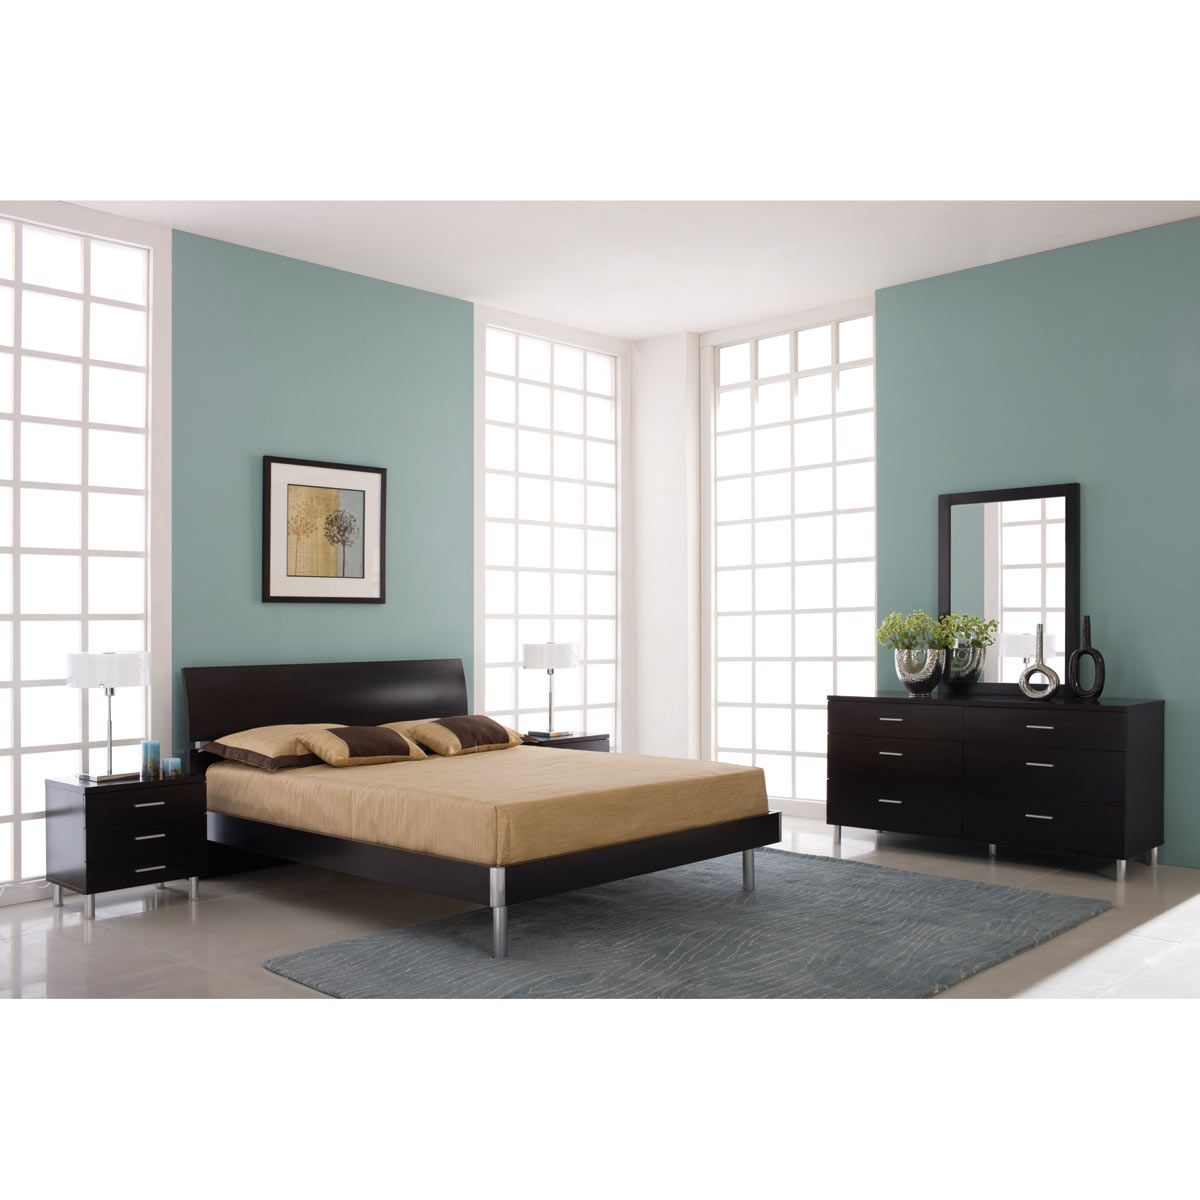 Kinwai 4 Piece King Bedroom Set